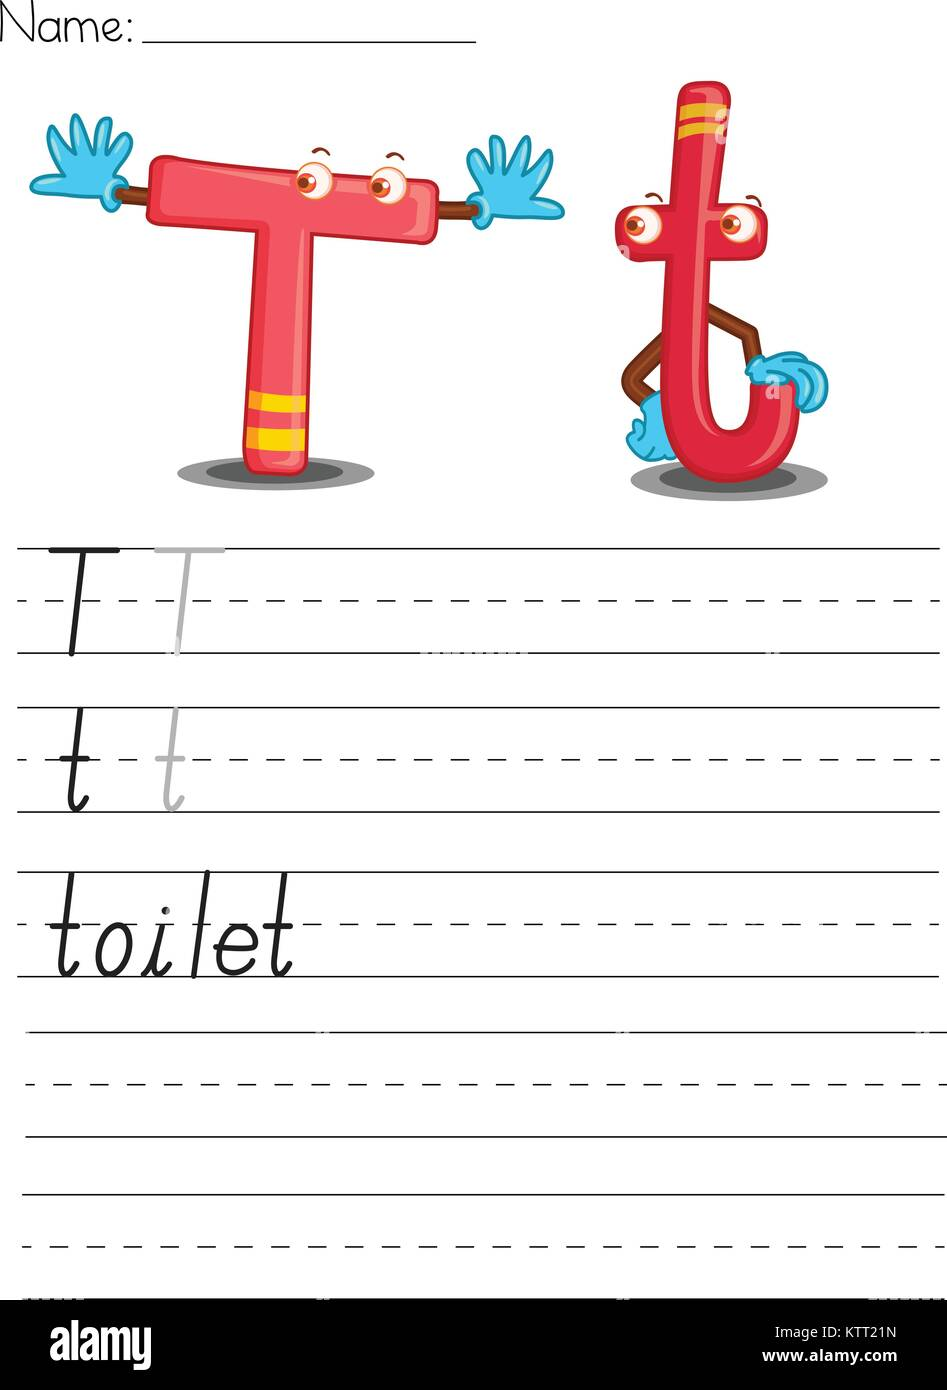 Illustrierte alphabet Arbeitsblatt der Buchstabe t Vektor Abbildung ...